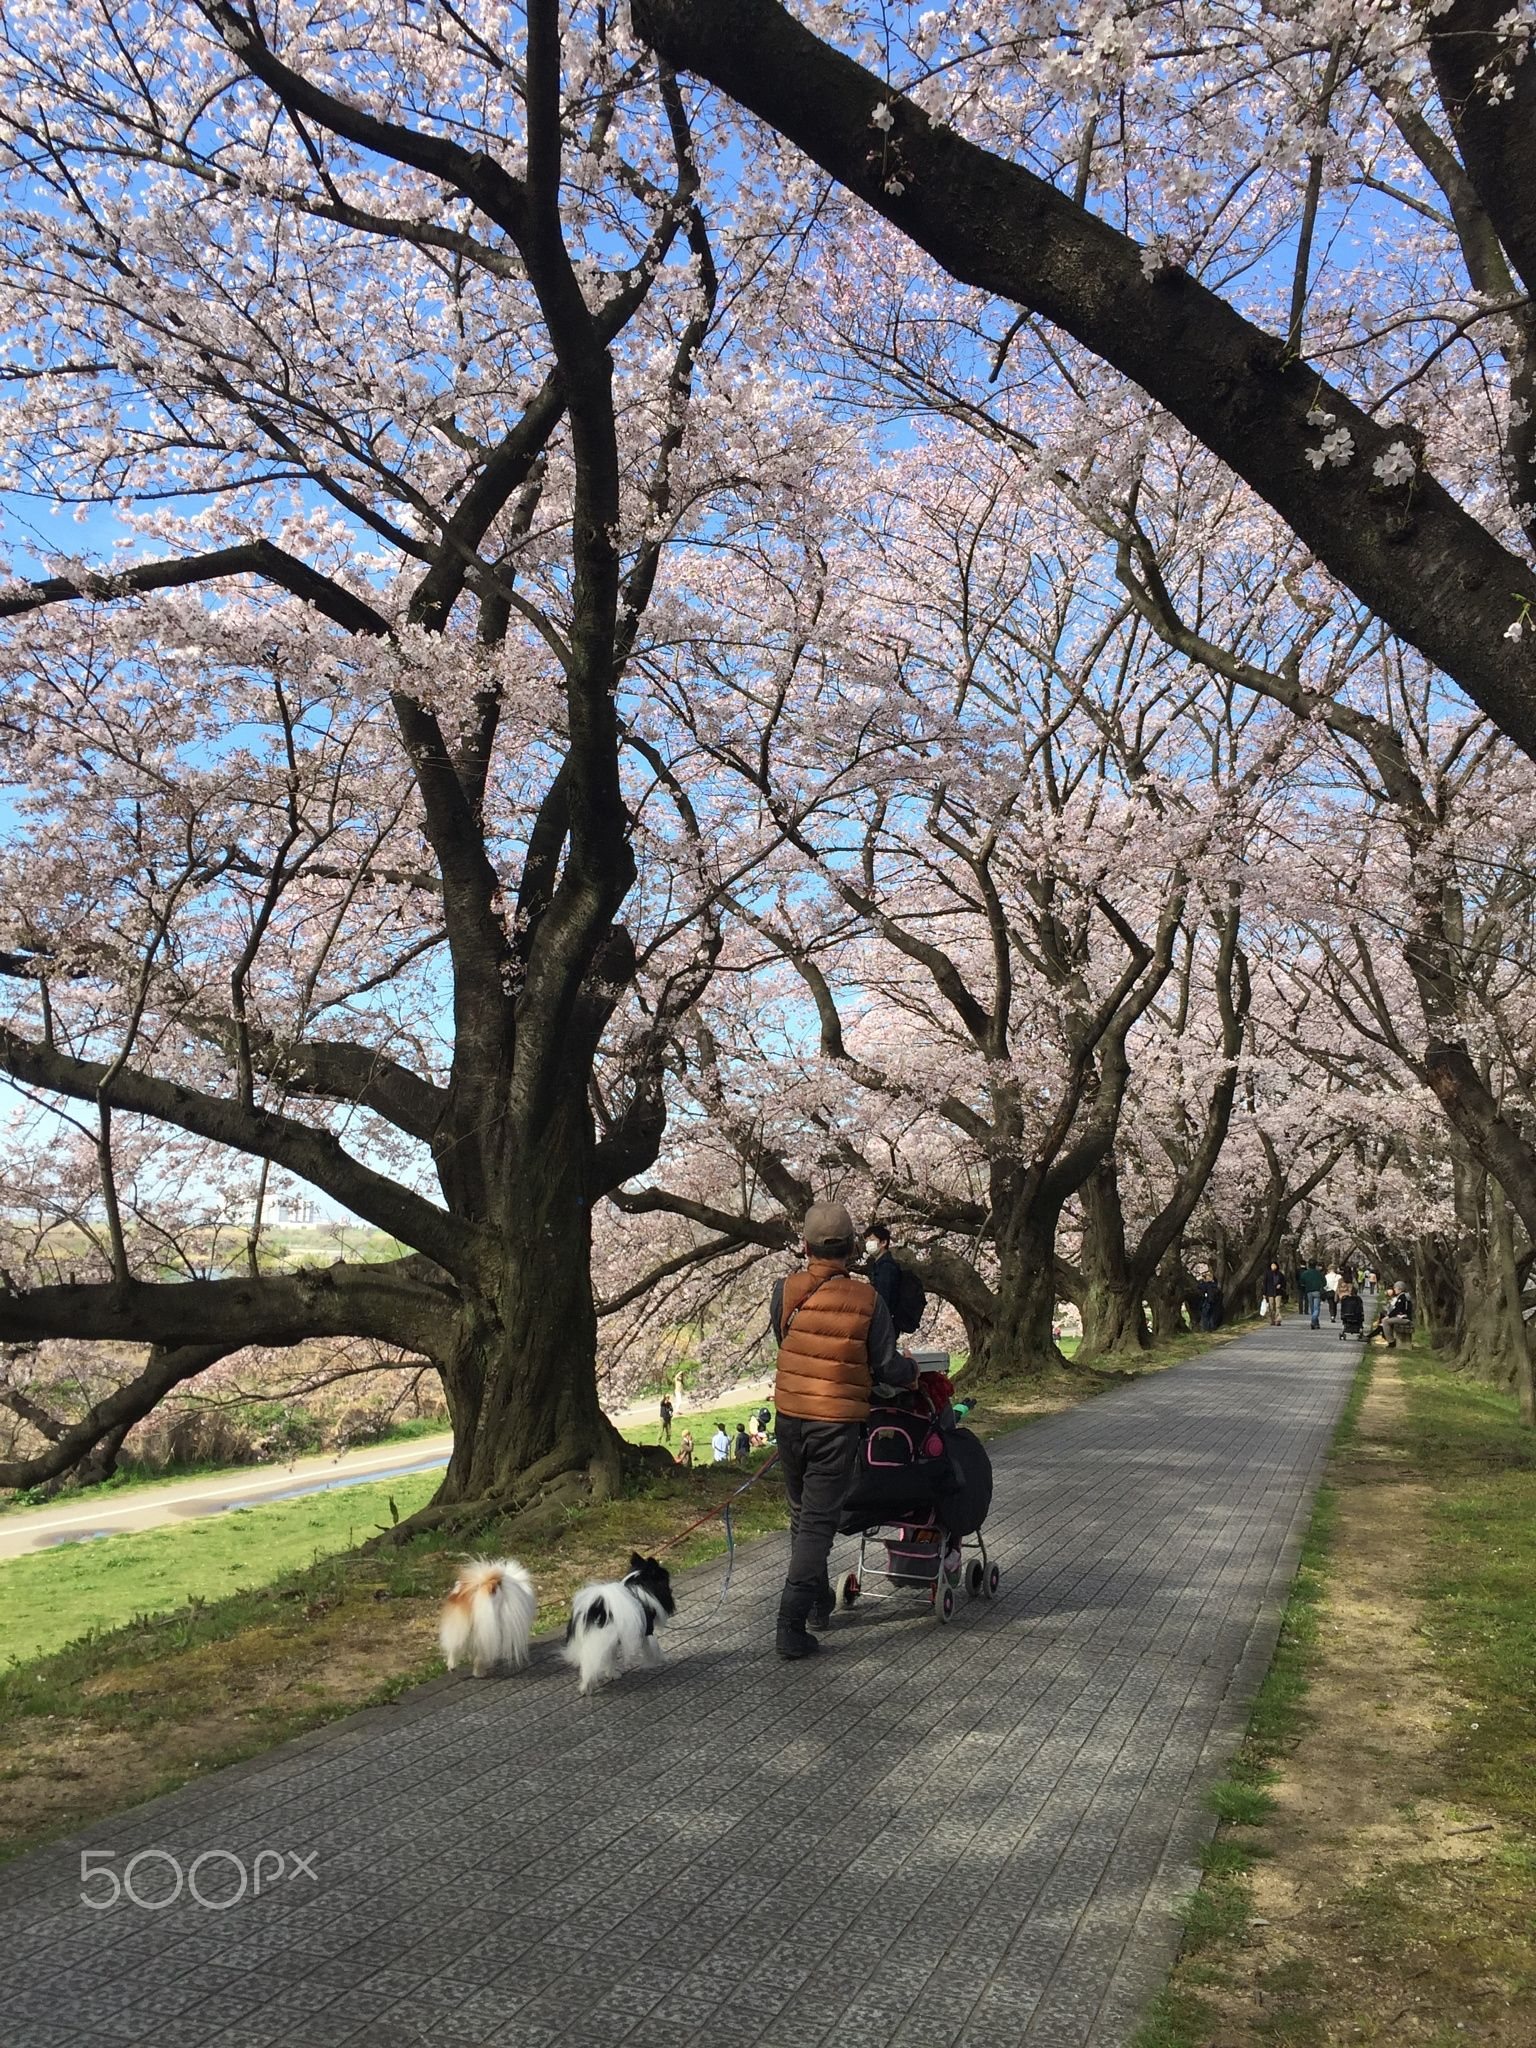 Walking with dogs - At Sewaritei.